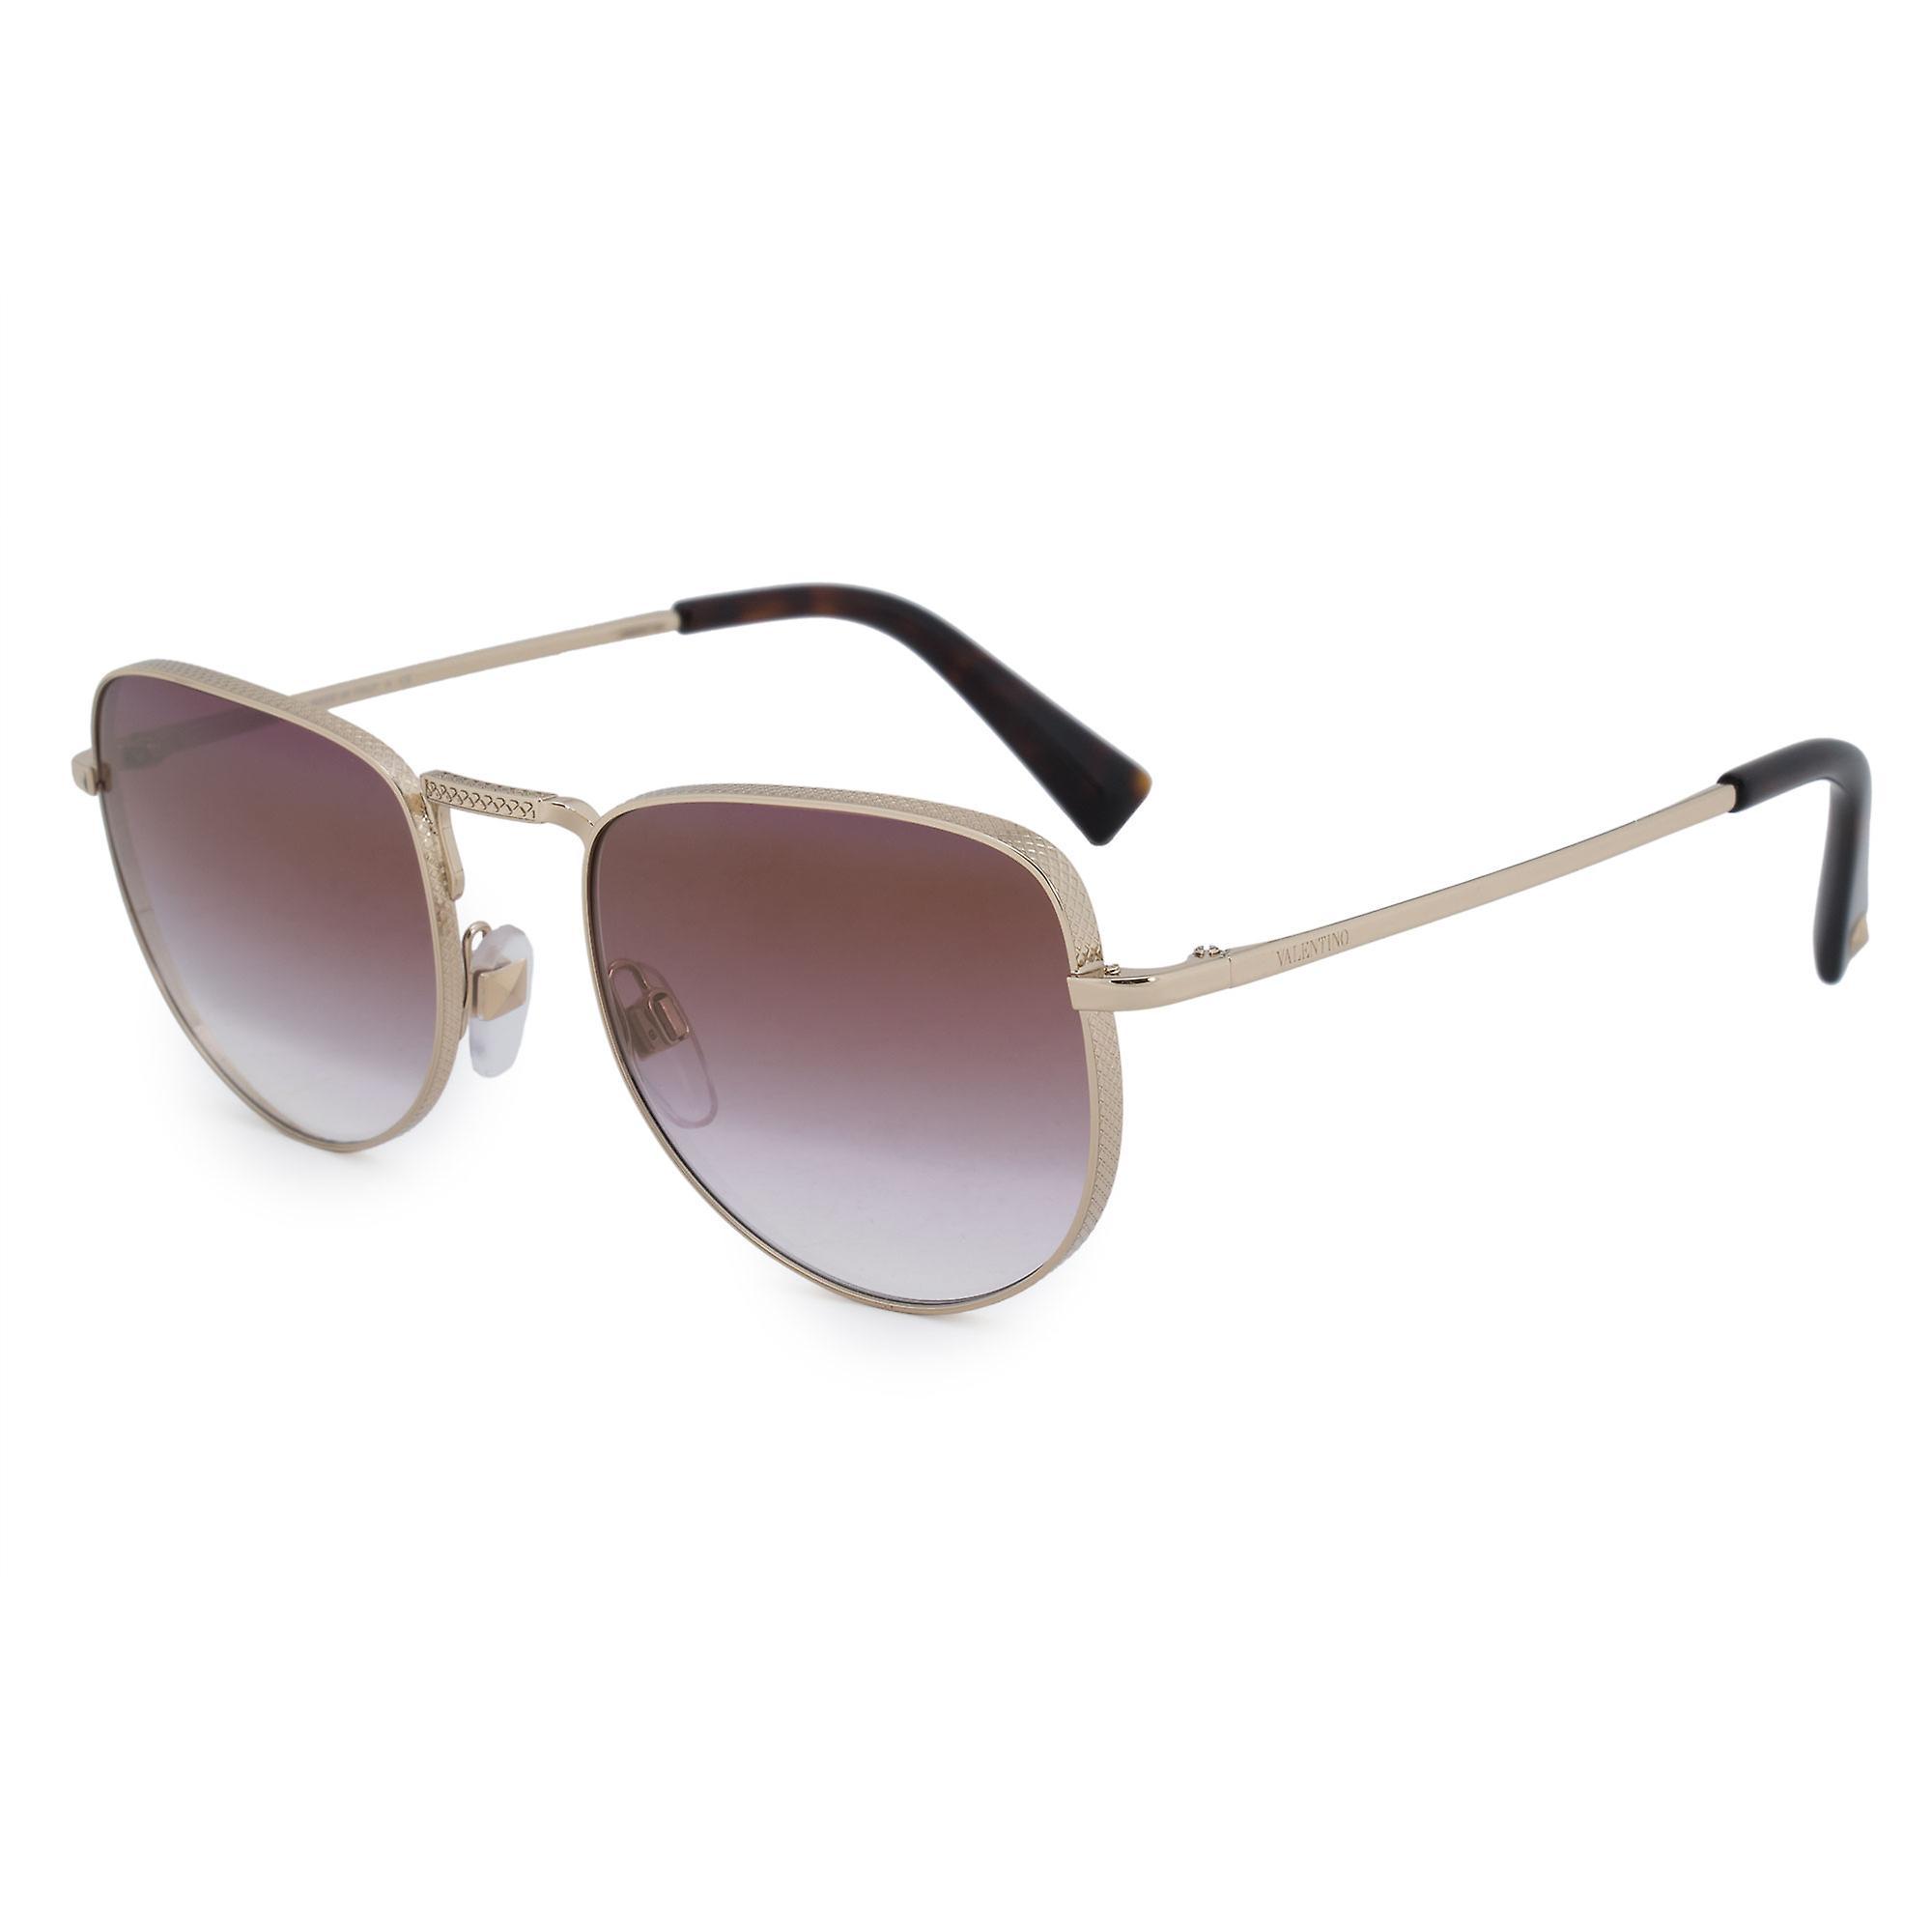 Valentino Square Sunglasses VA2012 3003E7 49